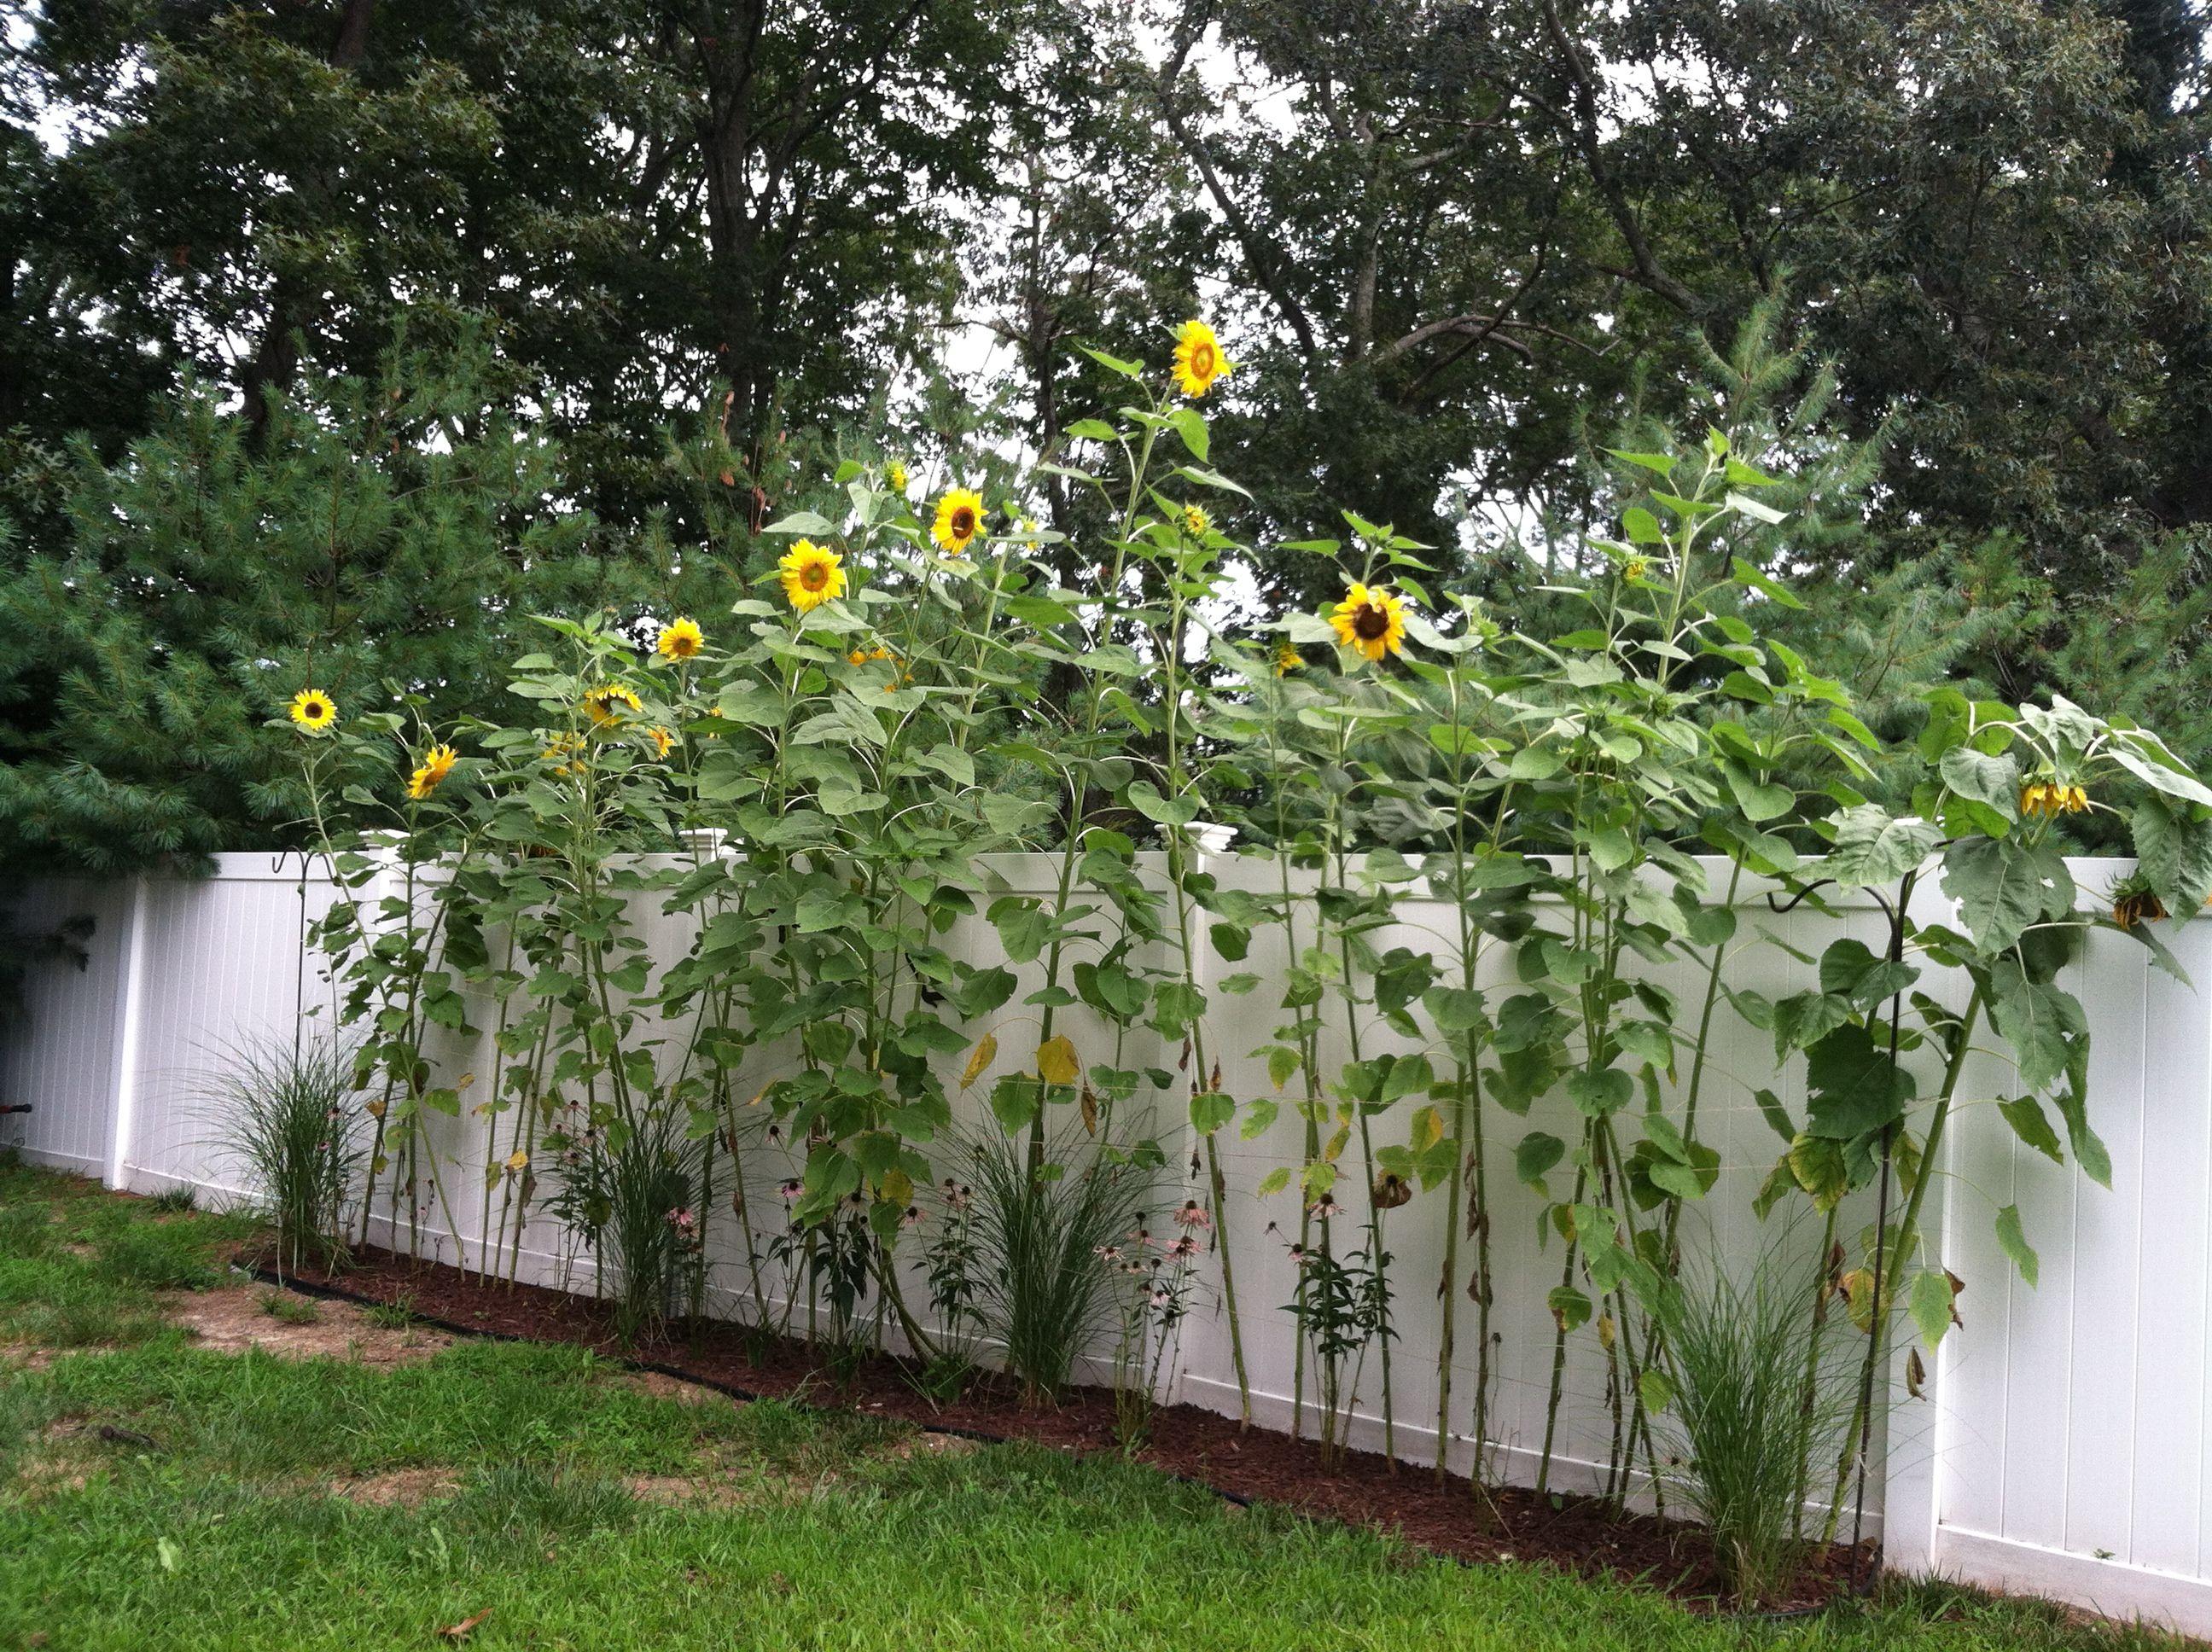 Sunflower Garden Ideas how to plant sunflowers in decorative pots Garden Ideas